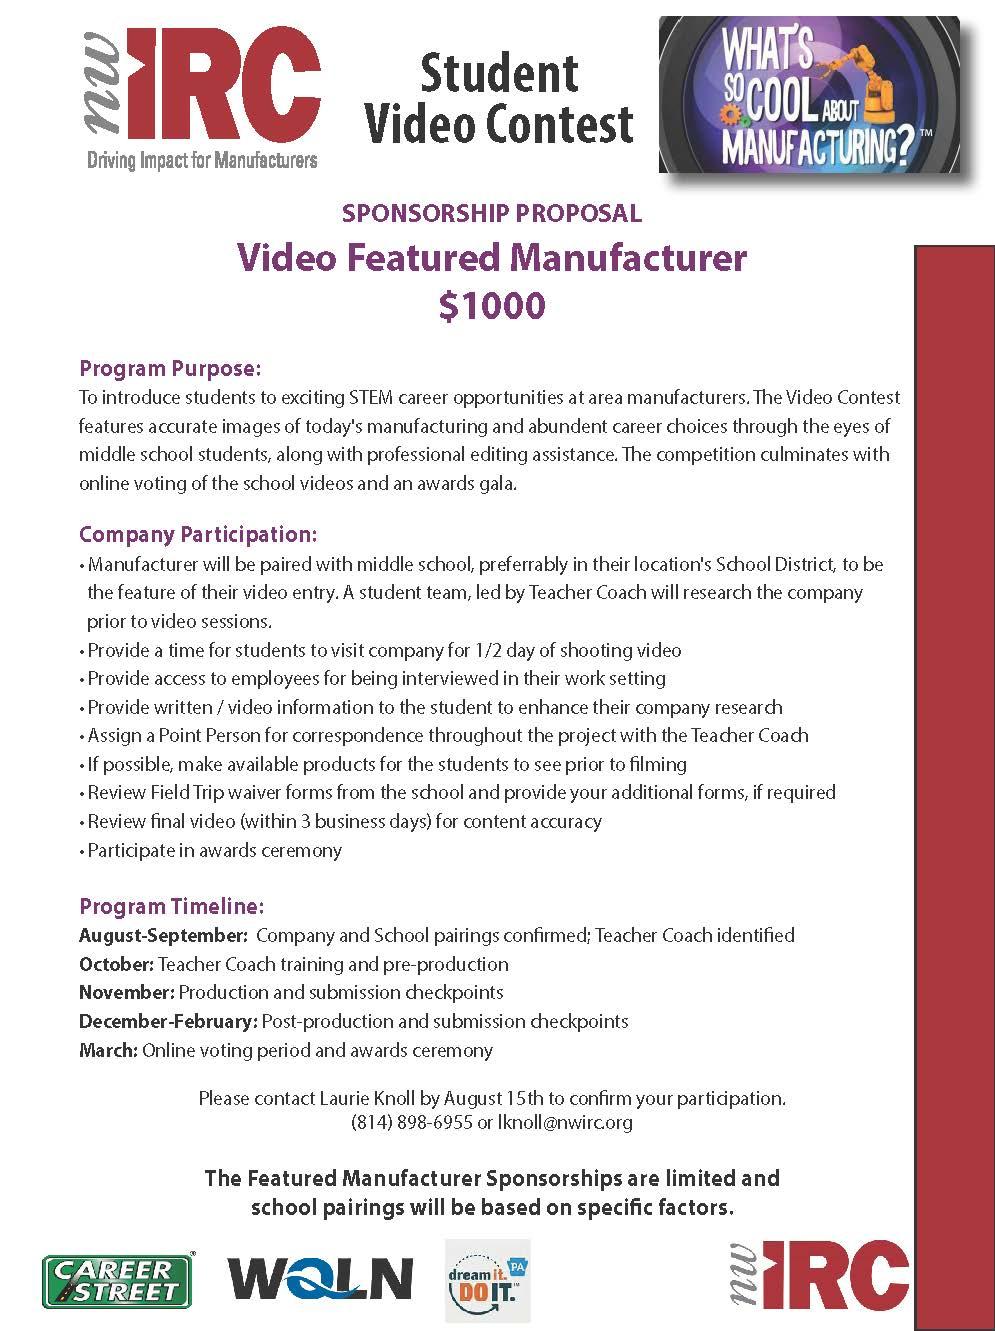 Dream It Do It Student Video Contest